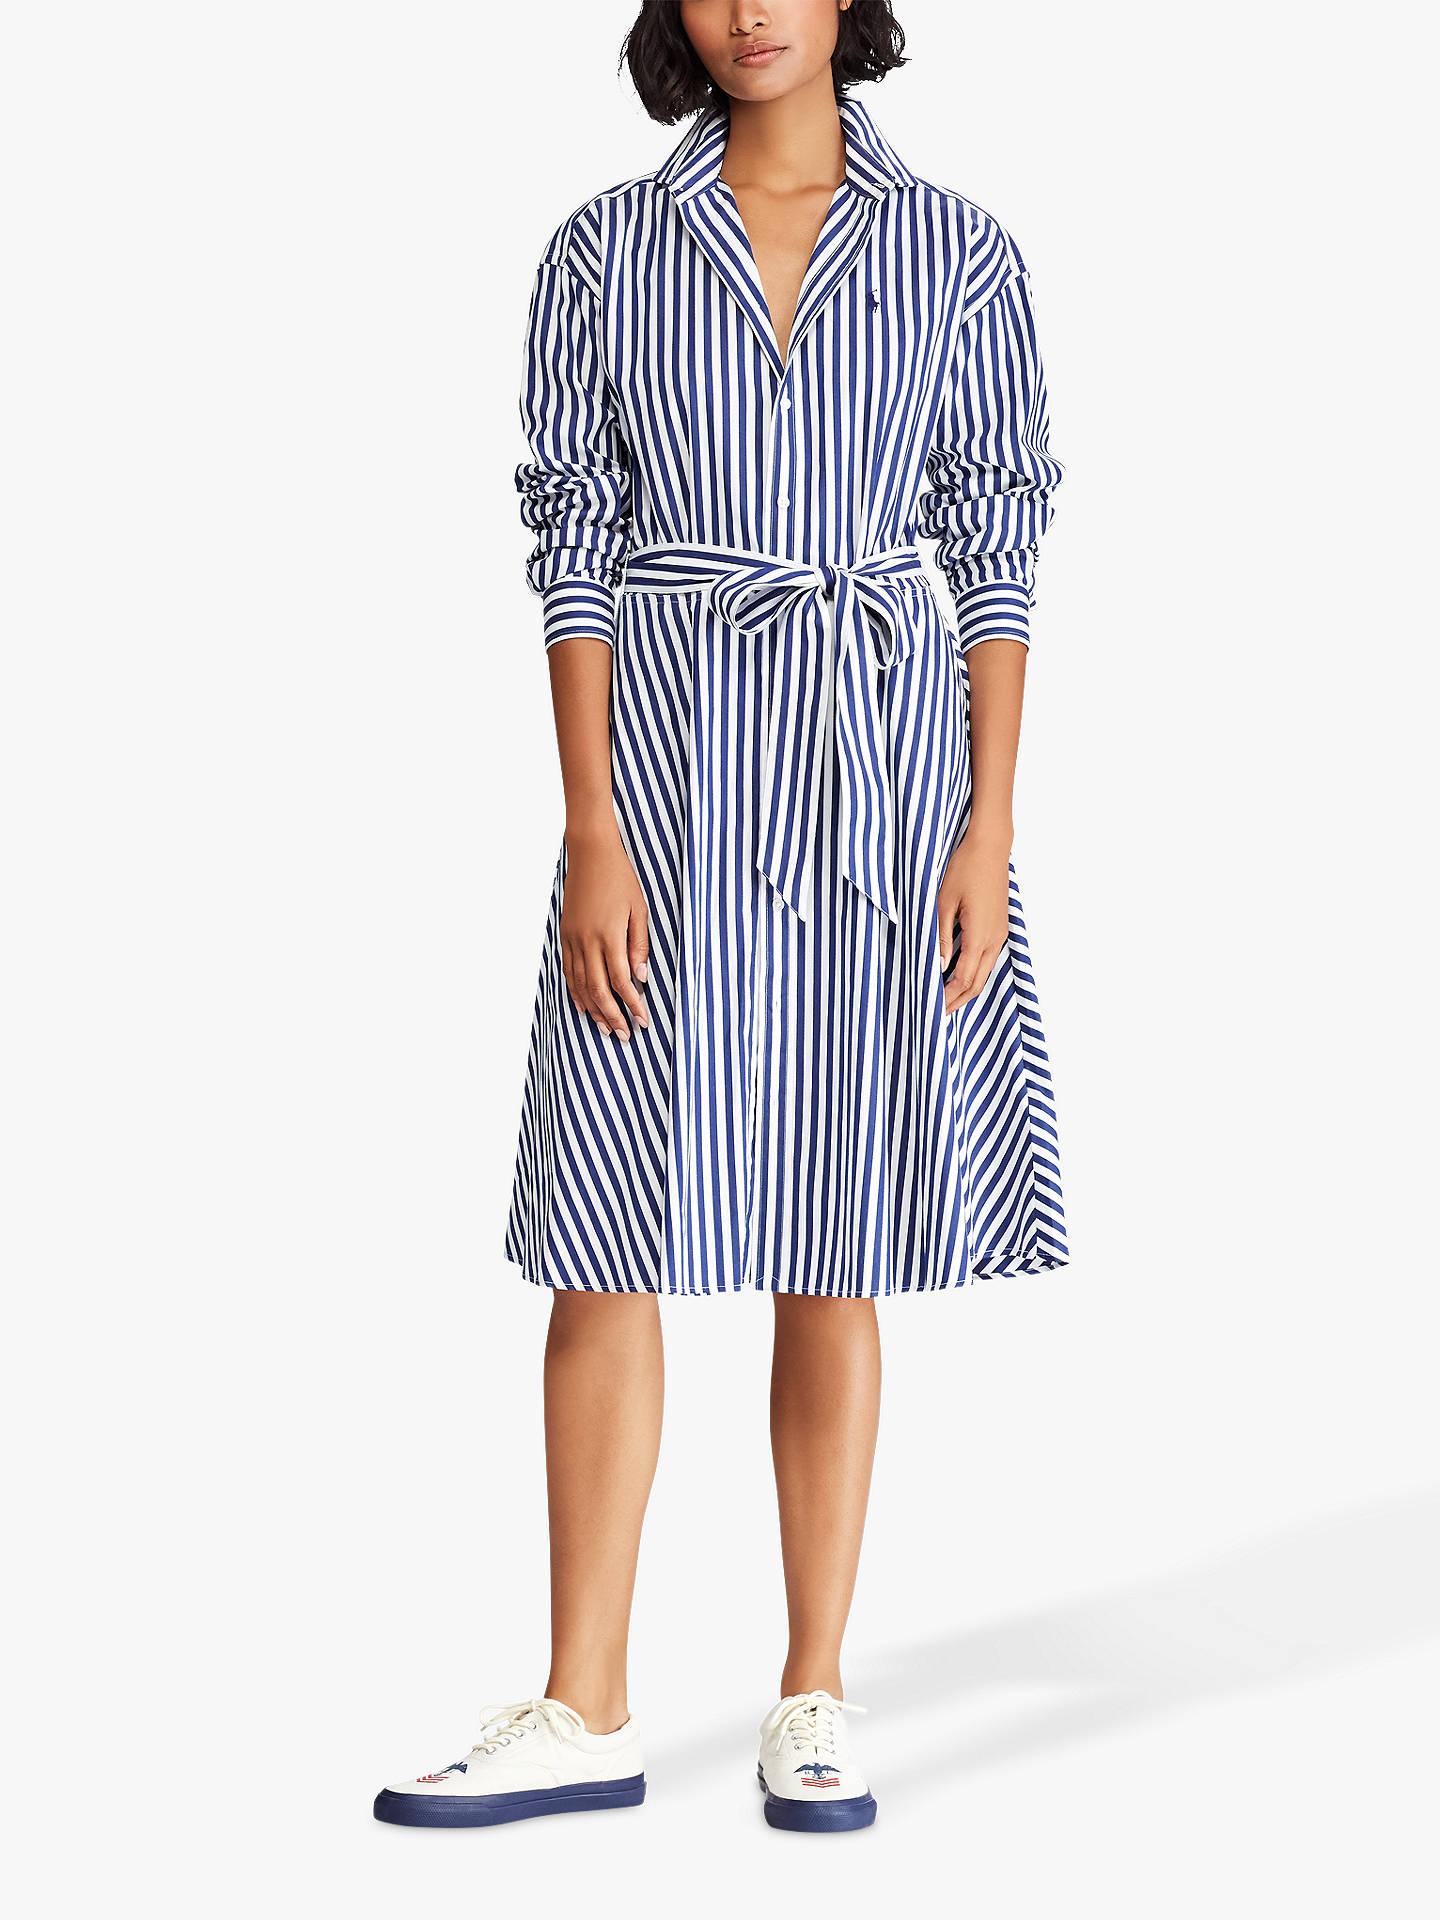 52a17850 Buy Polo Ralph Lauren Bengal Stripe Shirt Dress, Navy/White, 8 Online at ...